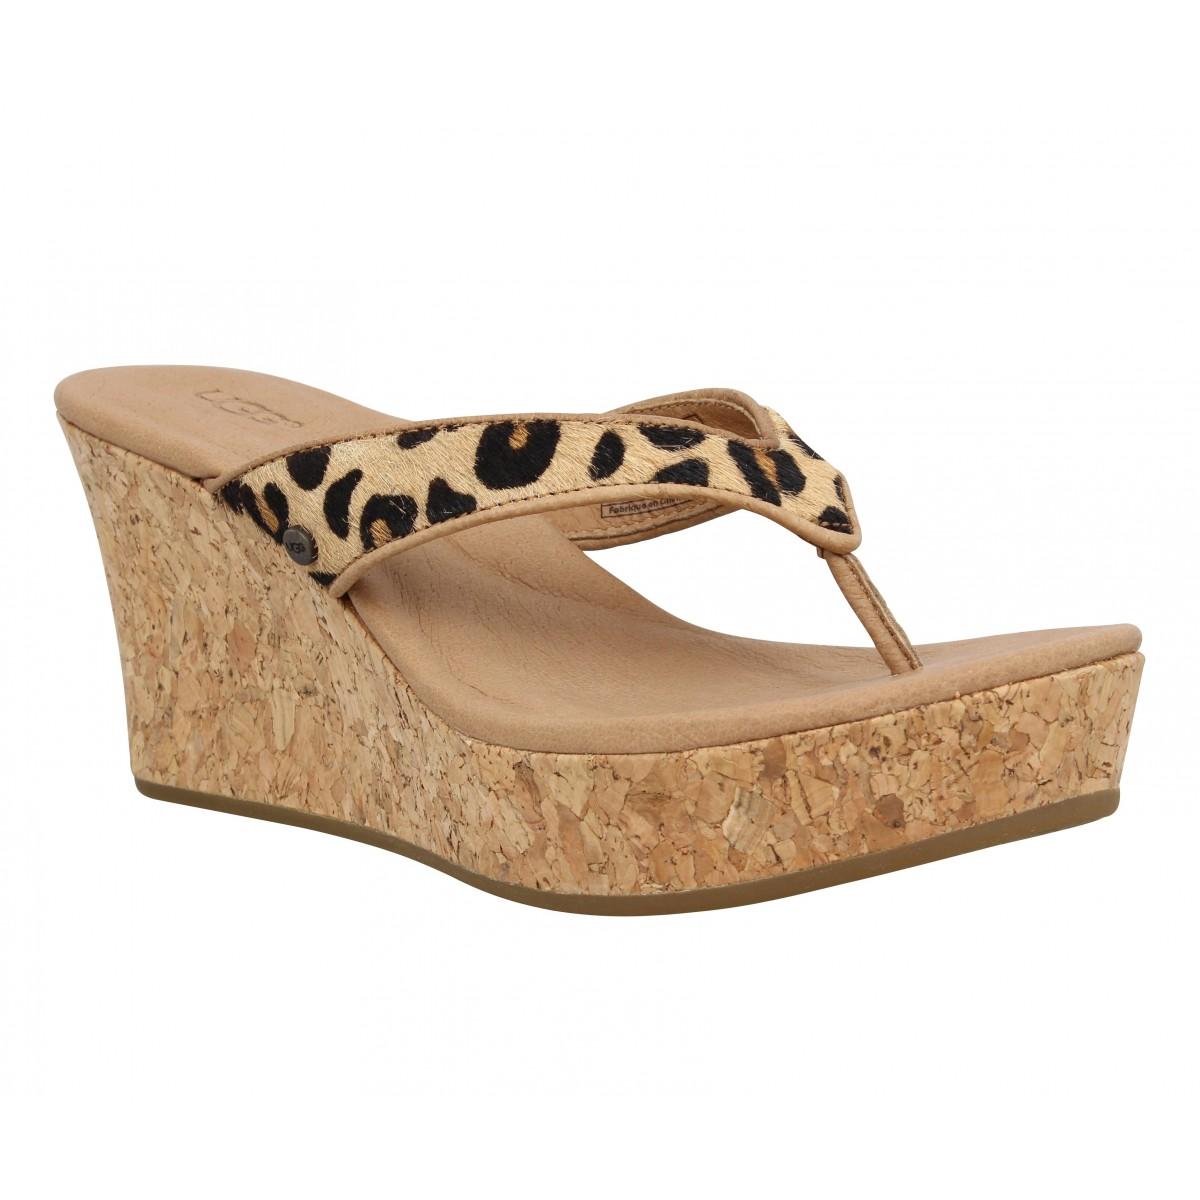 Compensées UGG AUSTRALIA Natassia cuir leopard Femme Chestnut